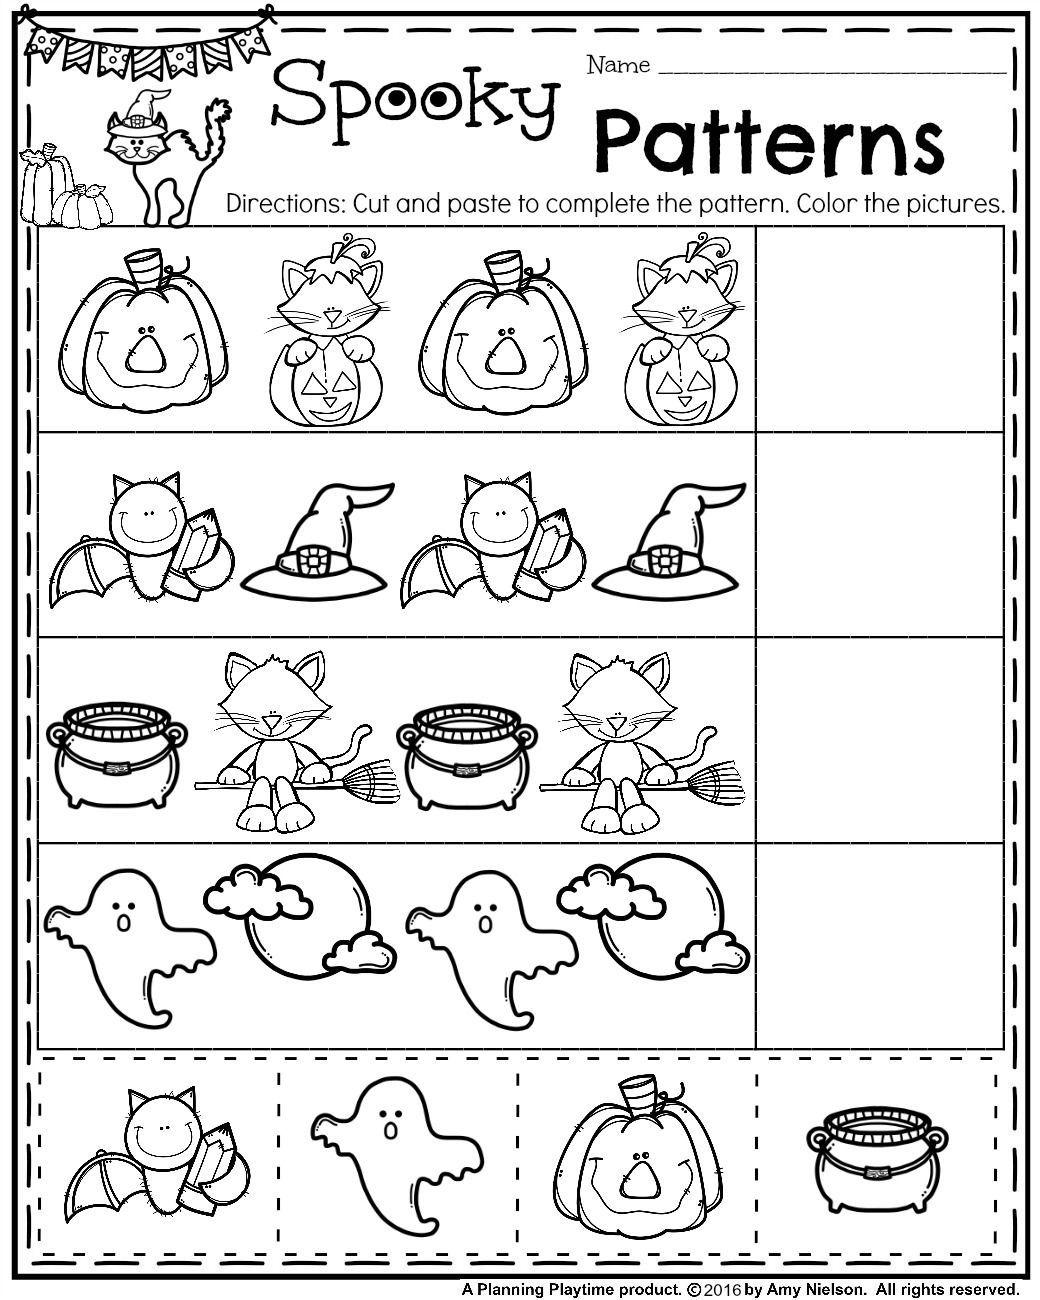 Preschool Pattern Worksheets for October. Wenn du mehr